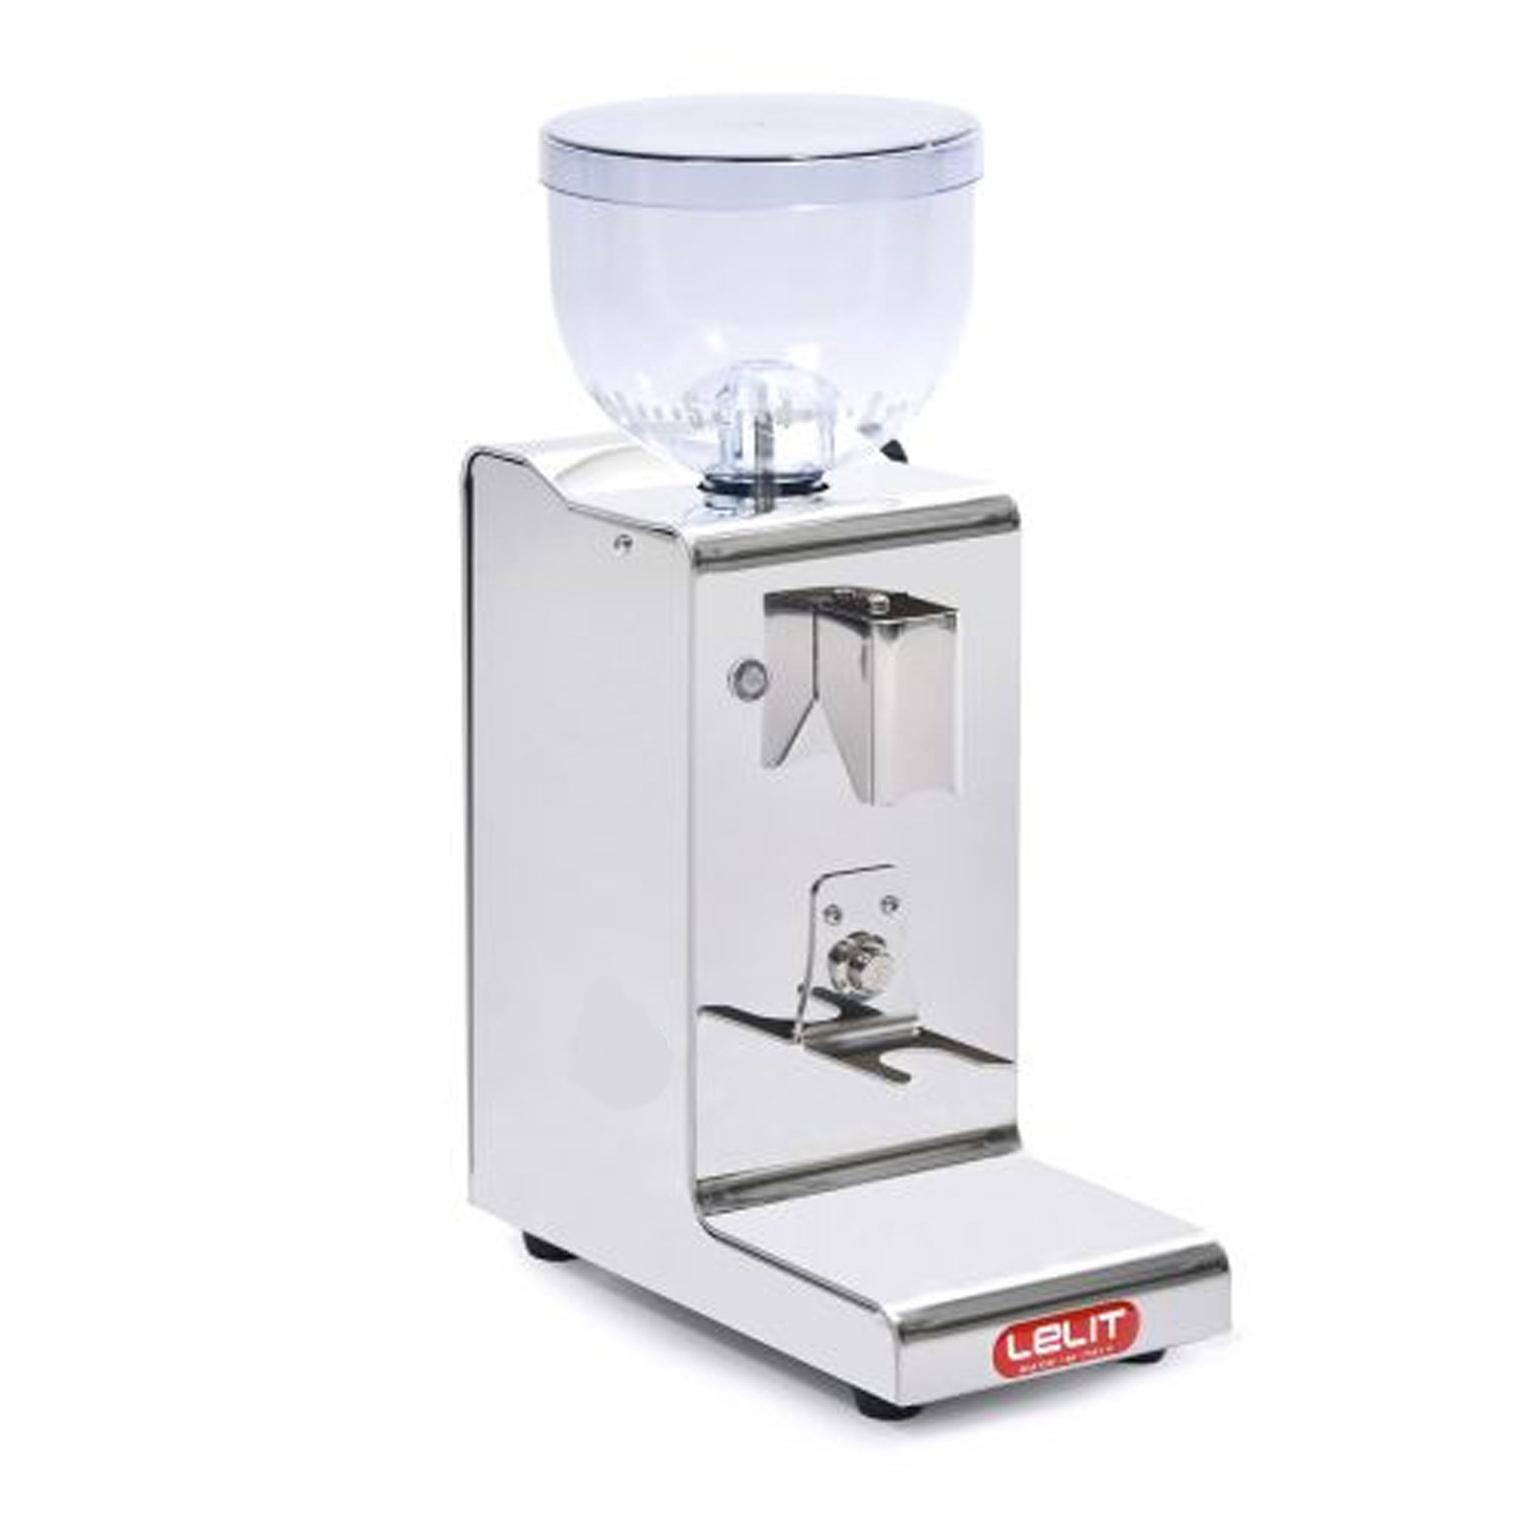 Lelit PL44MM elektrische Kaffeemühle